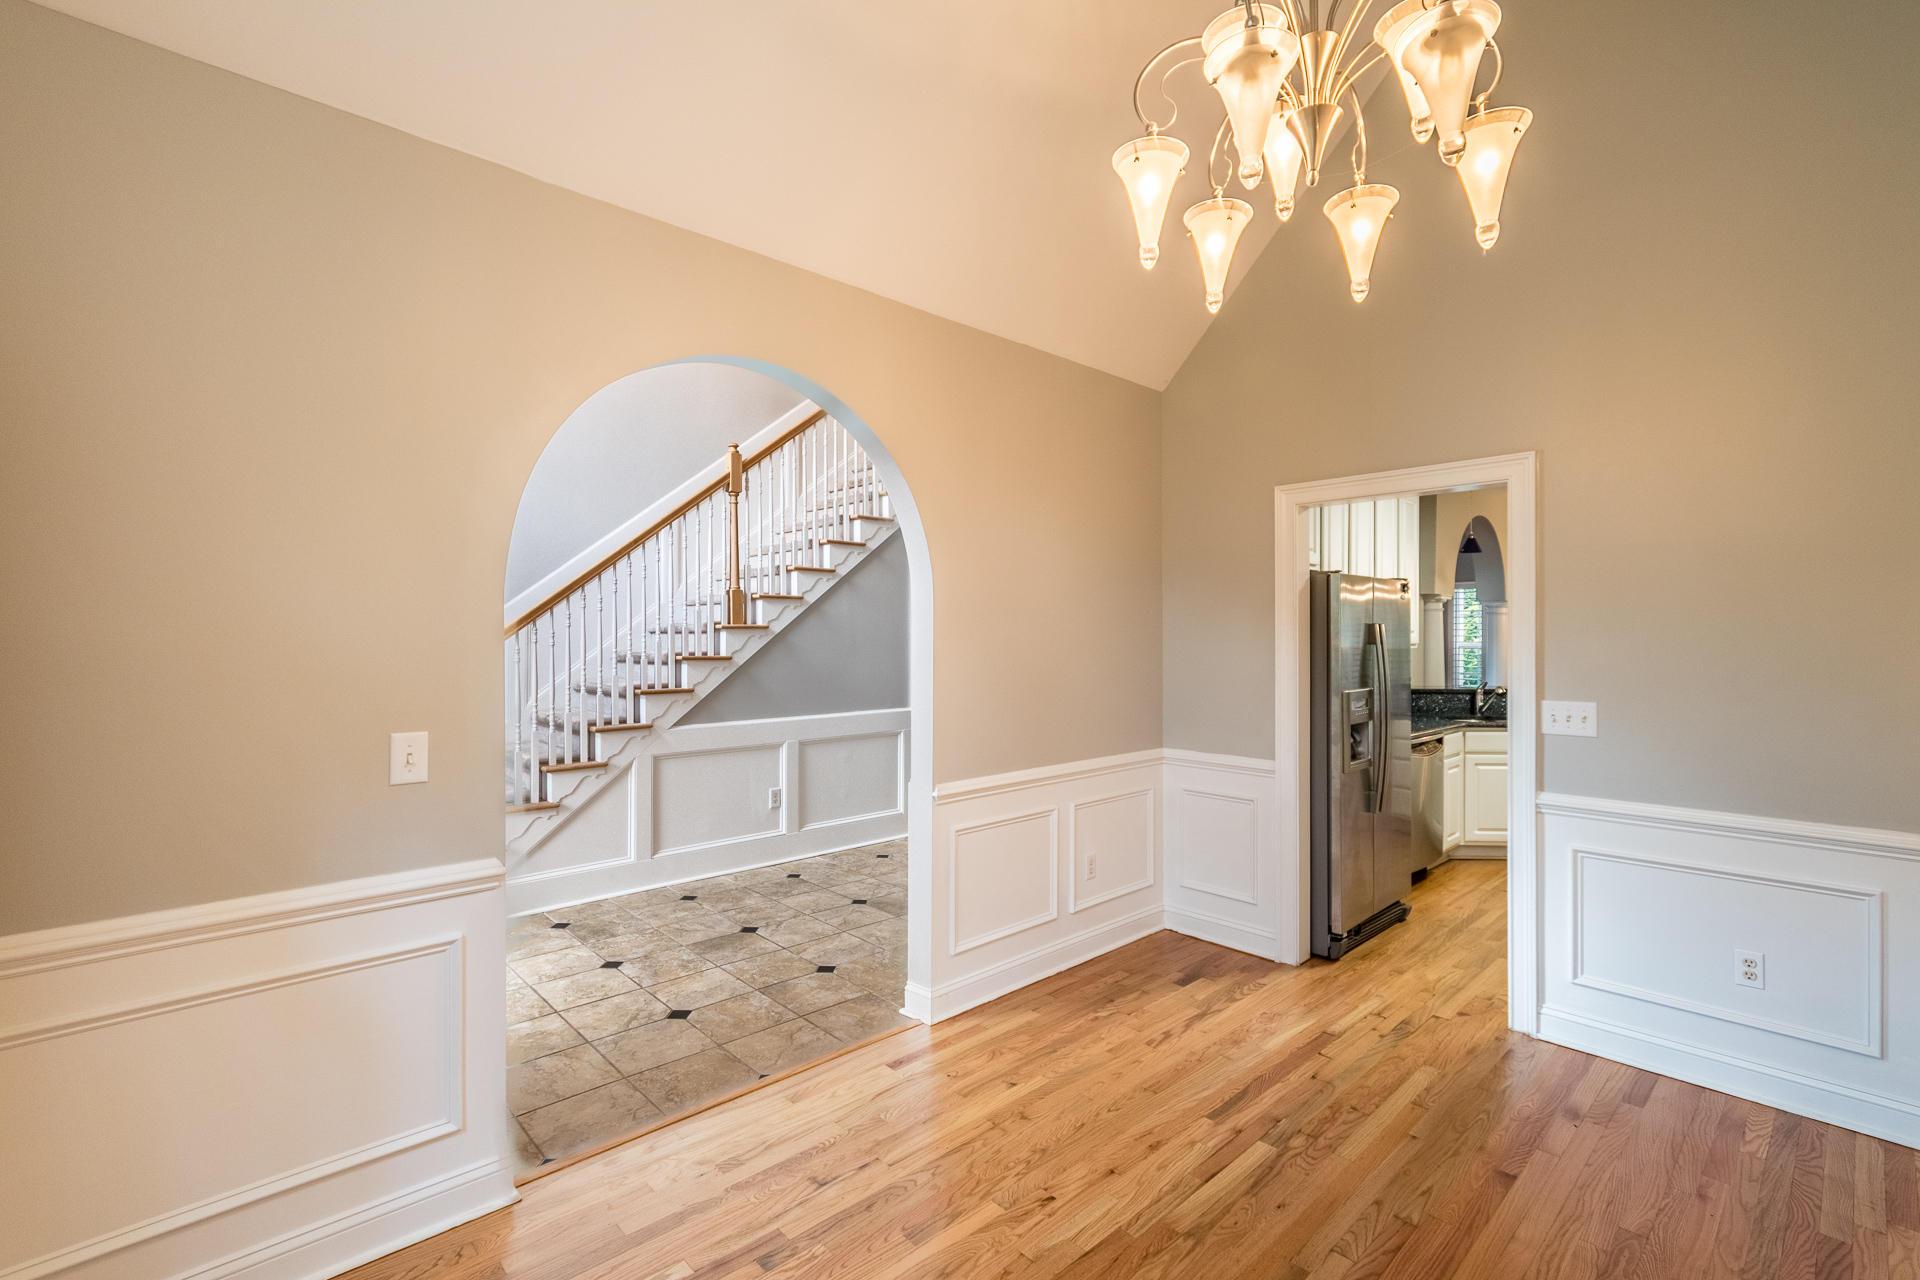 Stoneboro Shores Homes For Sale - 656 Stoneboro, Charleston, SC - 20